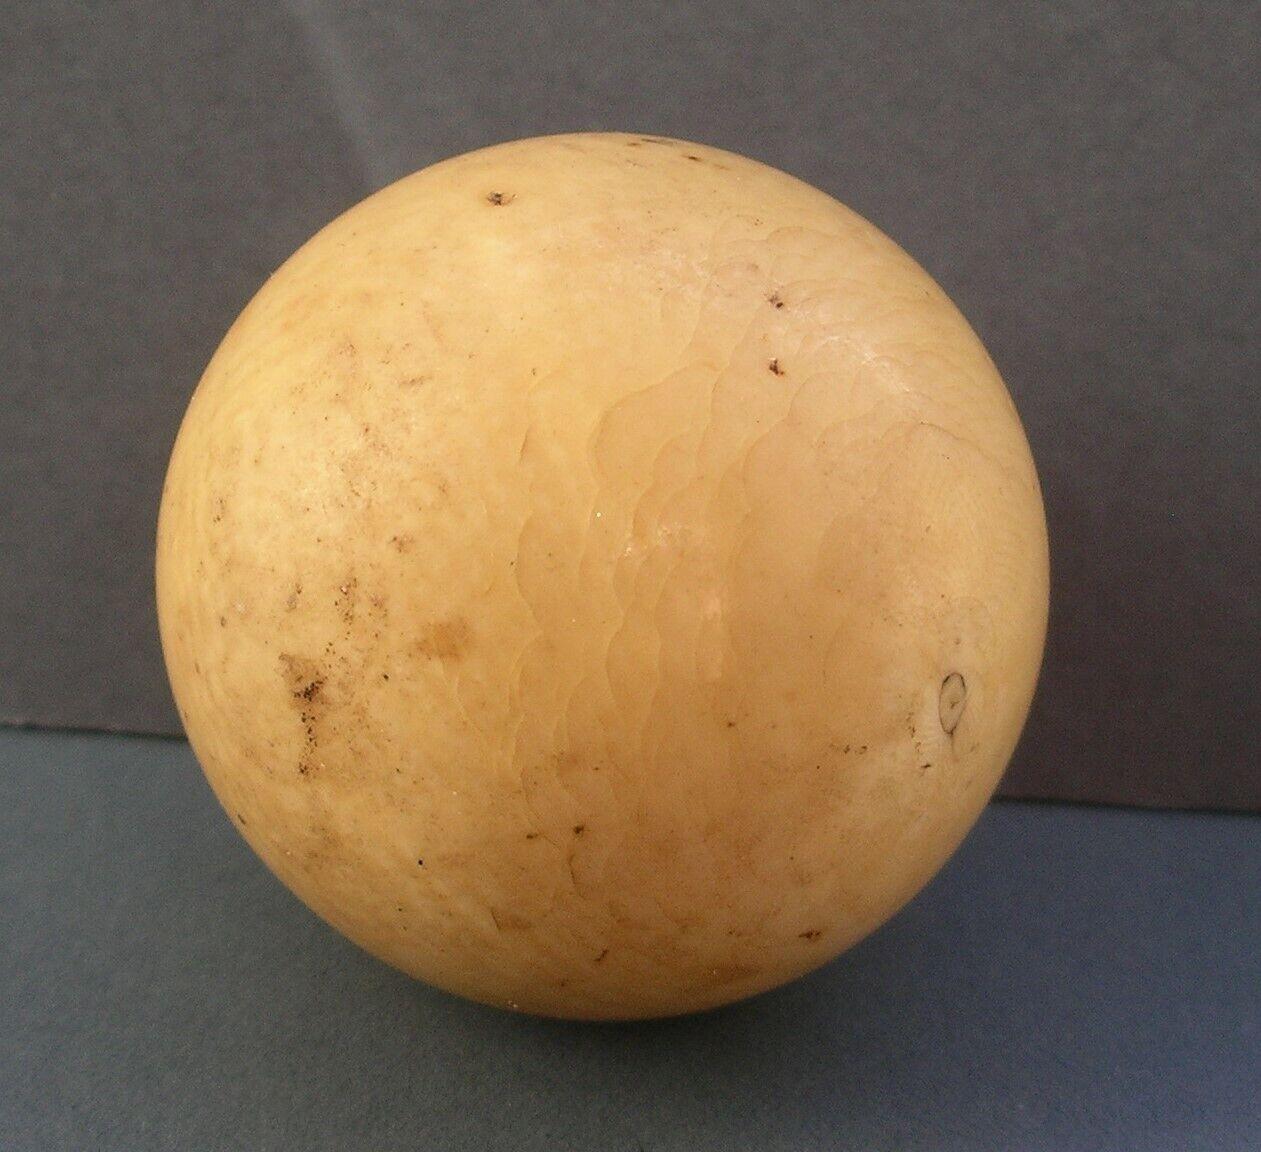 19th Century Original Antique Snooker Ball Weighs 4.7 oz 2 inches Diameter